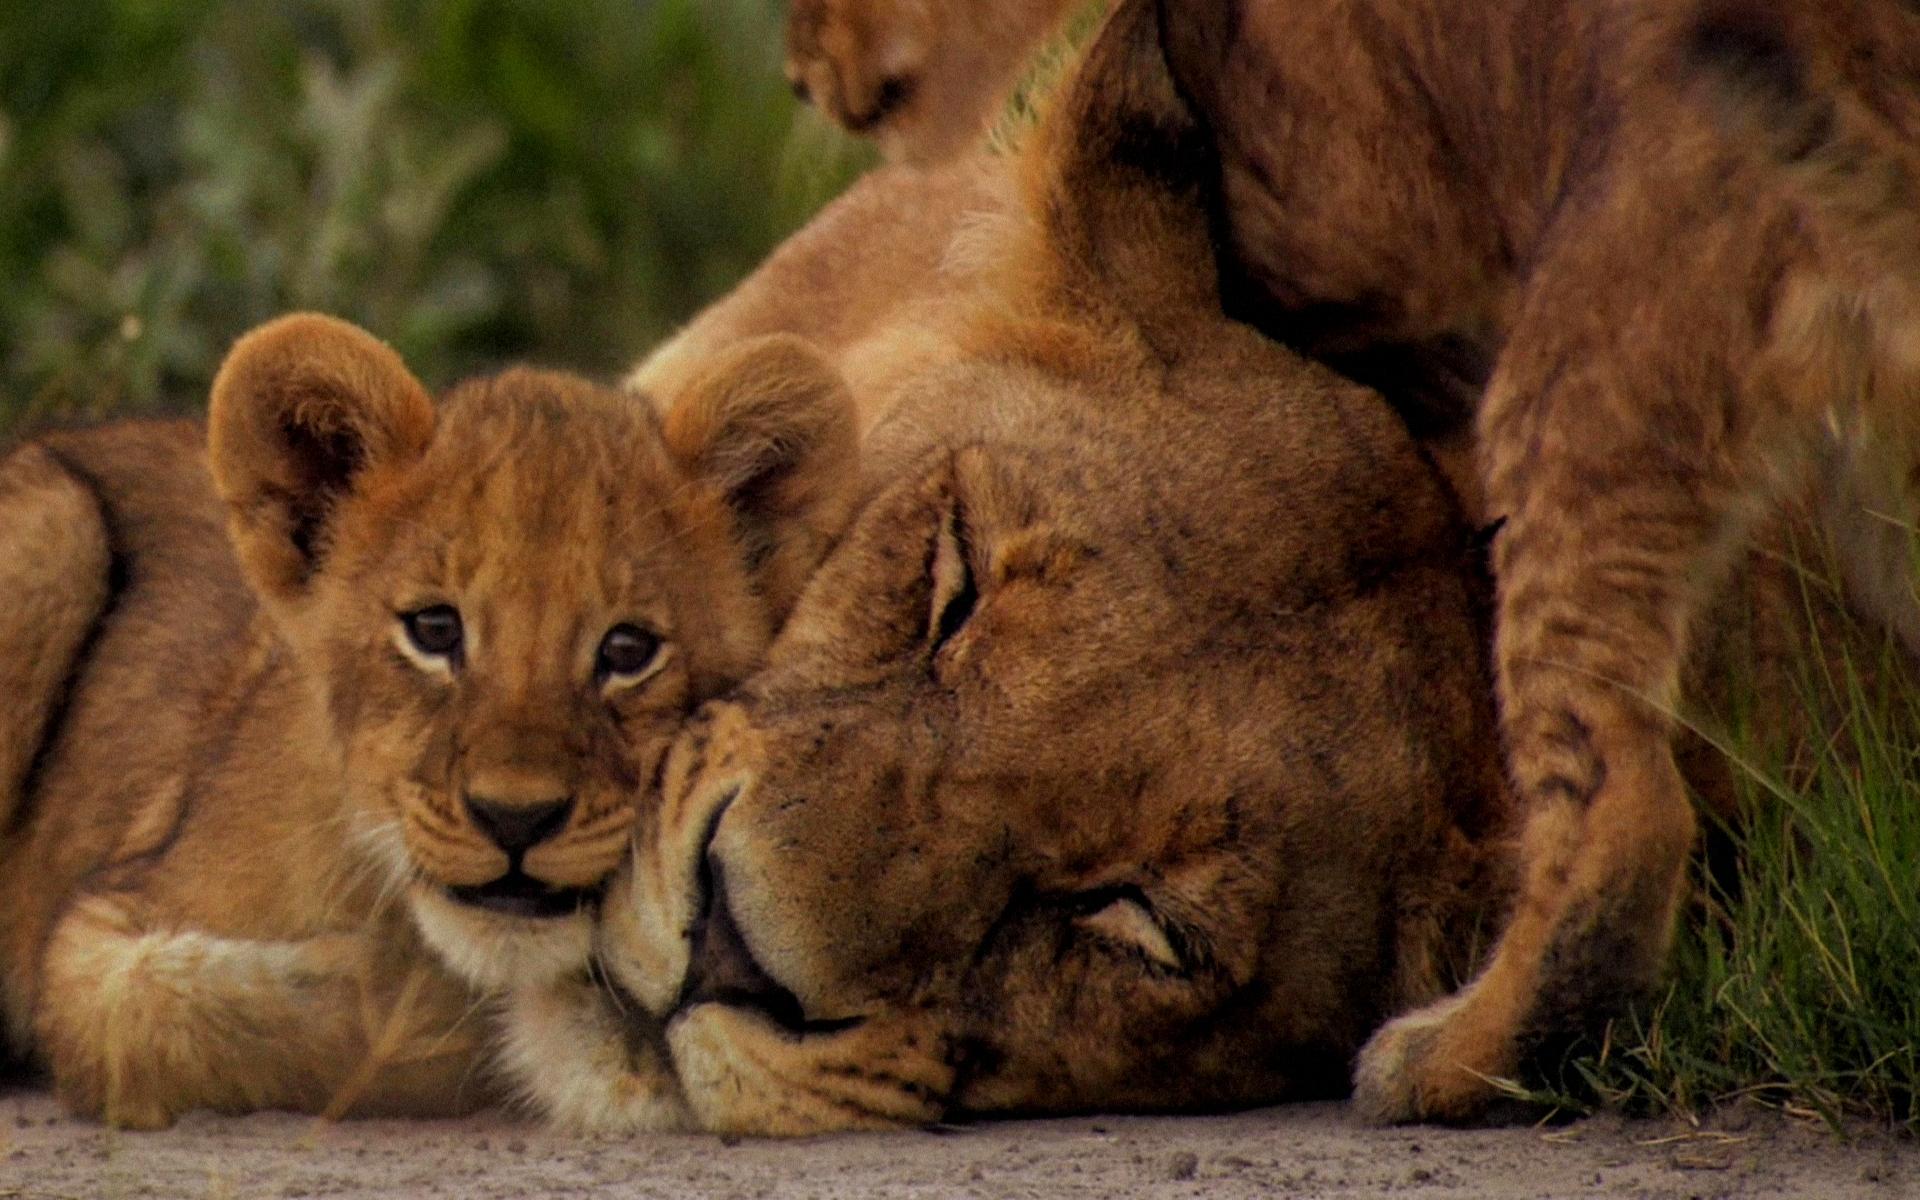 Cute Tiger Cubs Hd Wallpapers Lion Full Hd Fond D 233 Cran And Arri 232 Re Plan 1920x1200